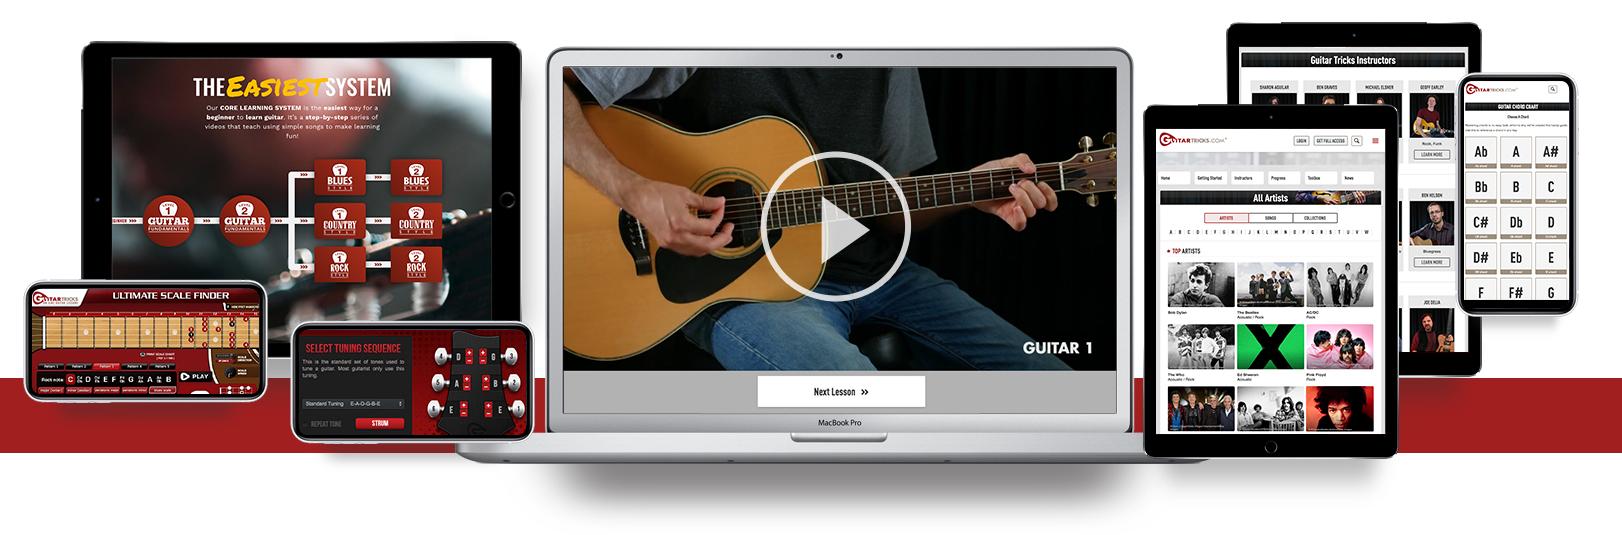 Best Online Guitar Lessons - Guitar Tricks